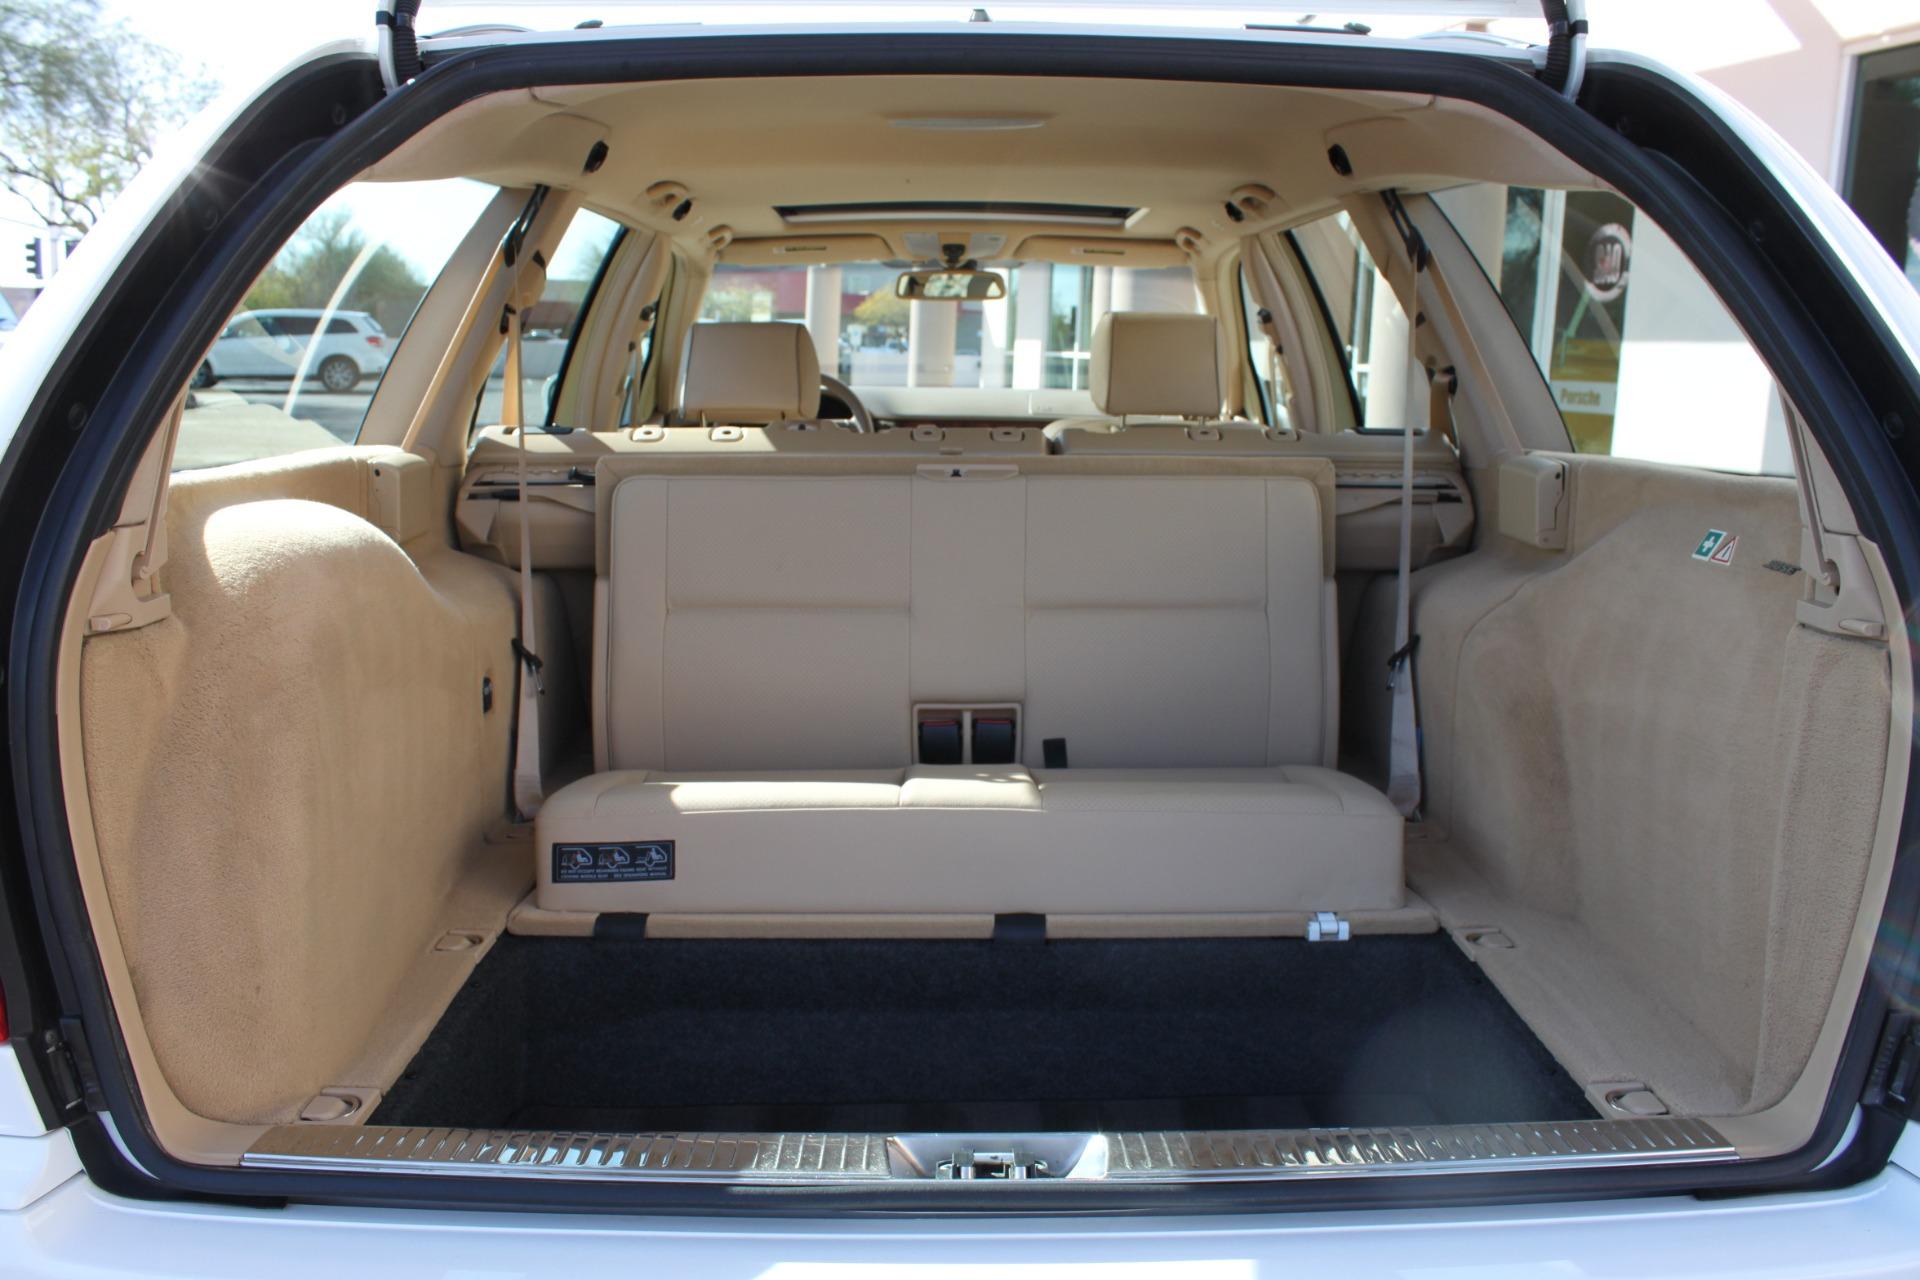 Used-2000-Mercedes-Benz-E-Class-Wagon-Dodge